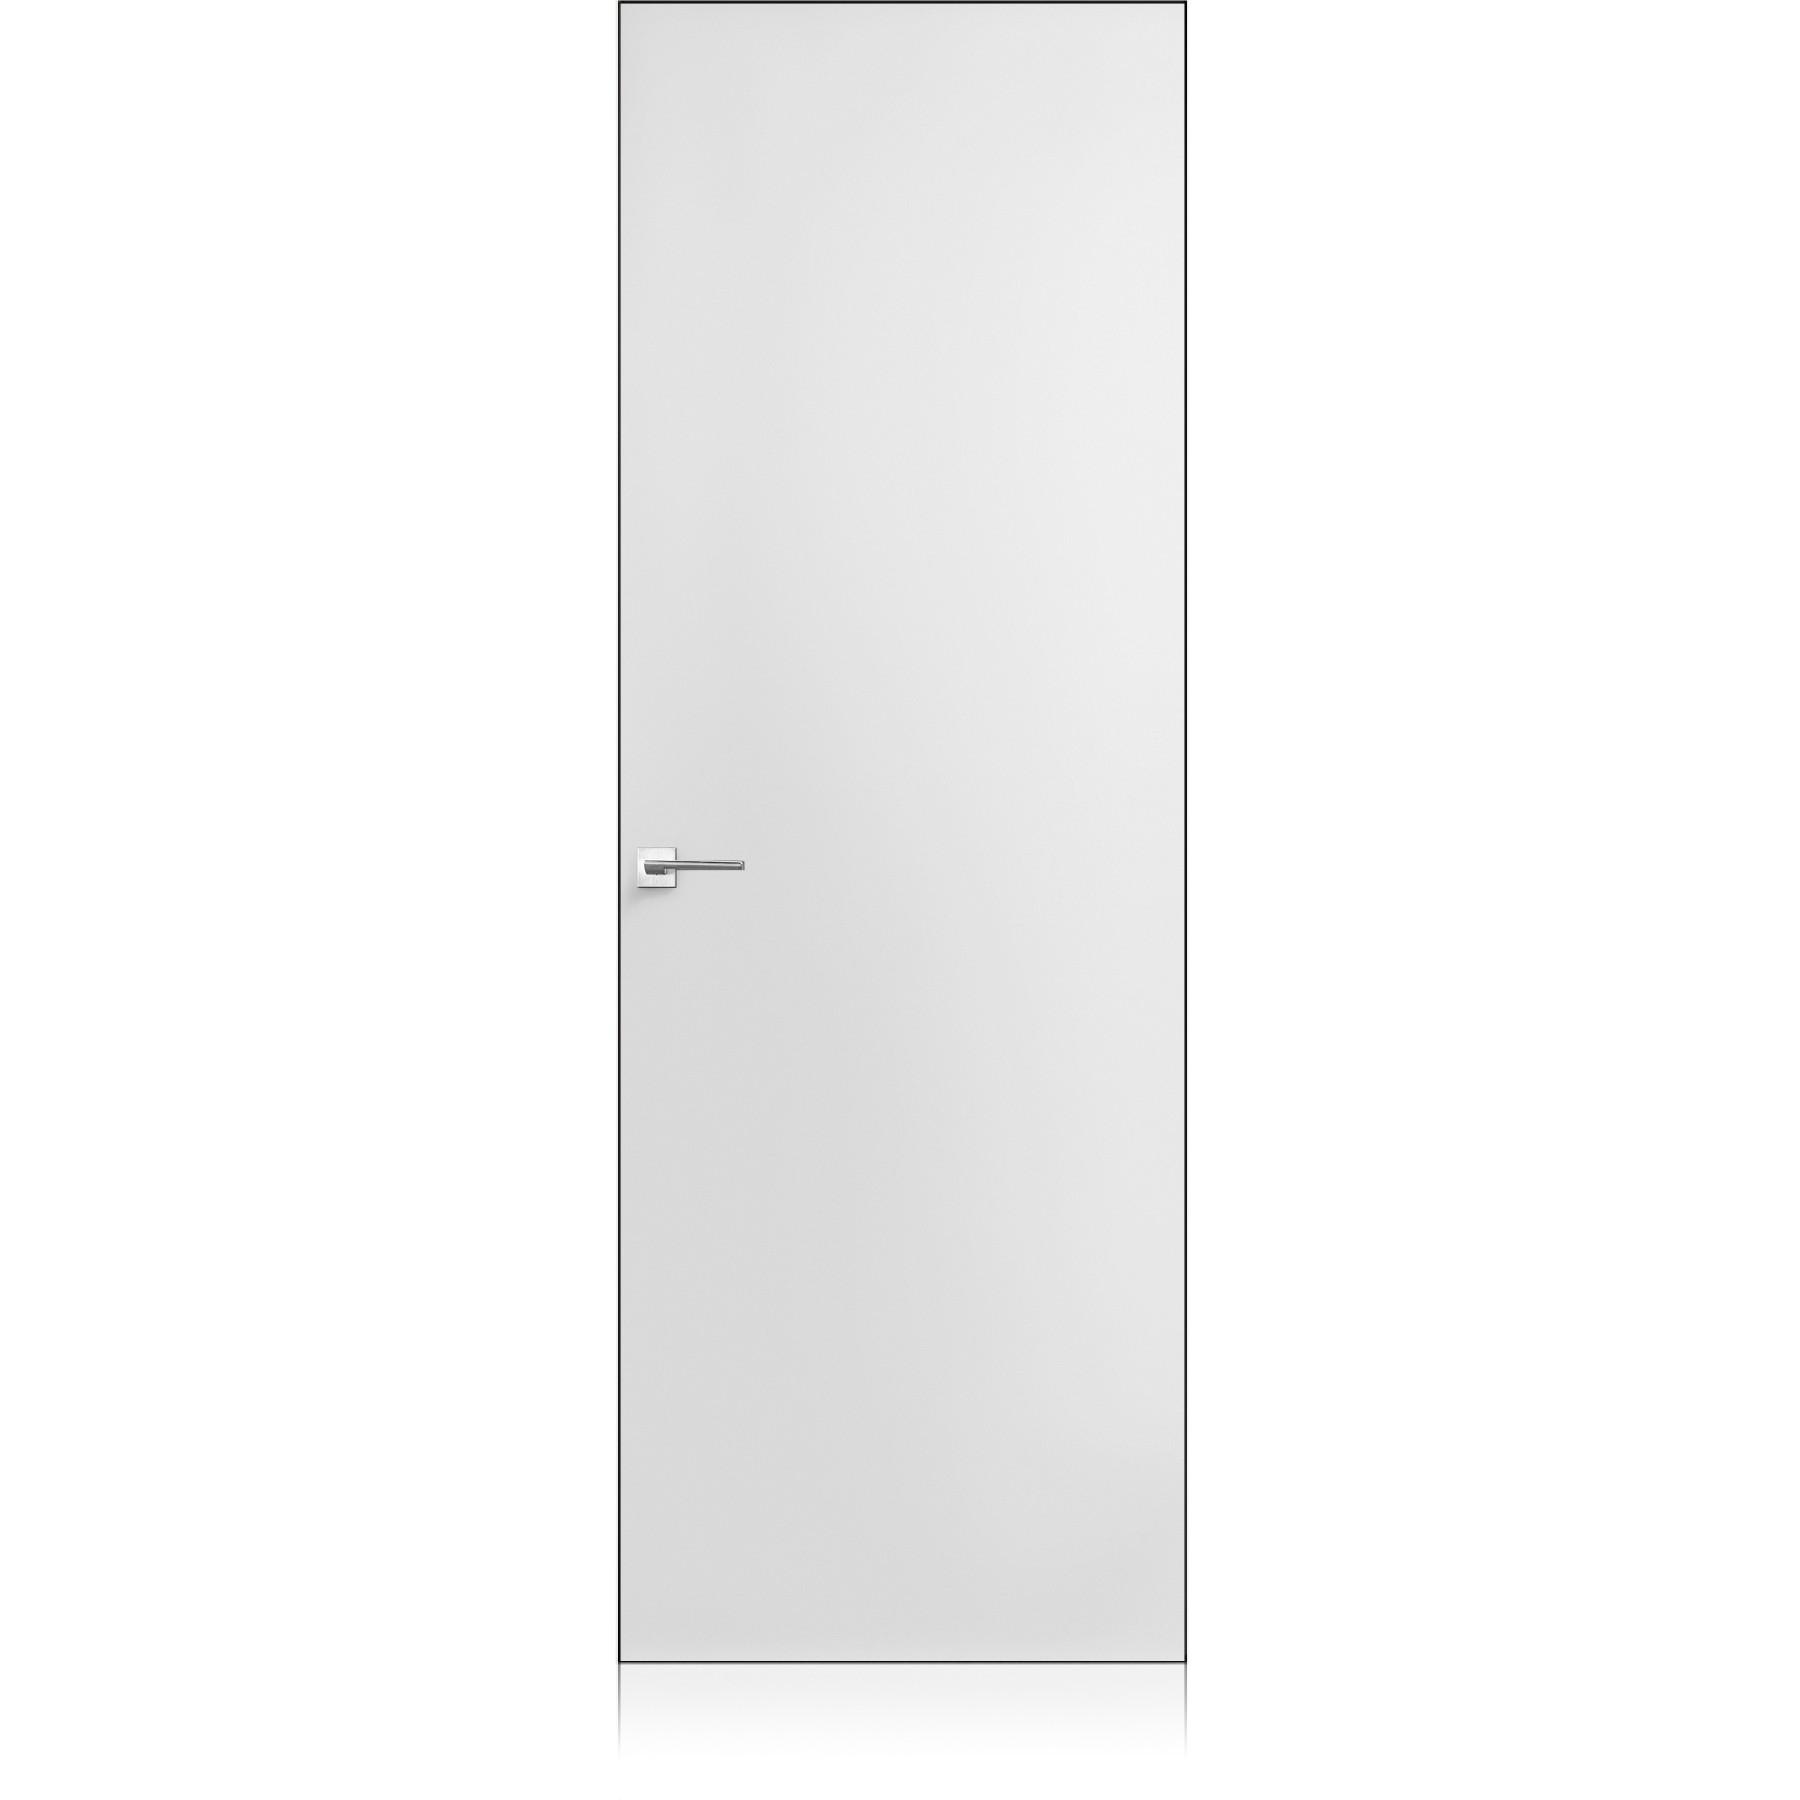 Equa Zero bianco optical door